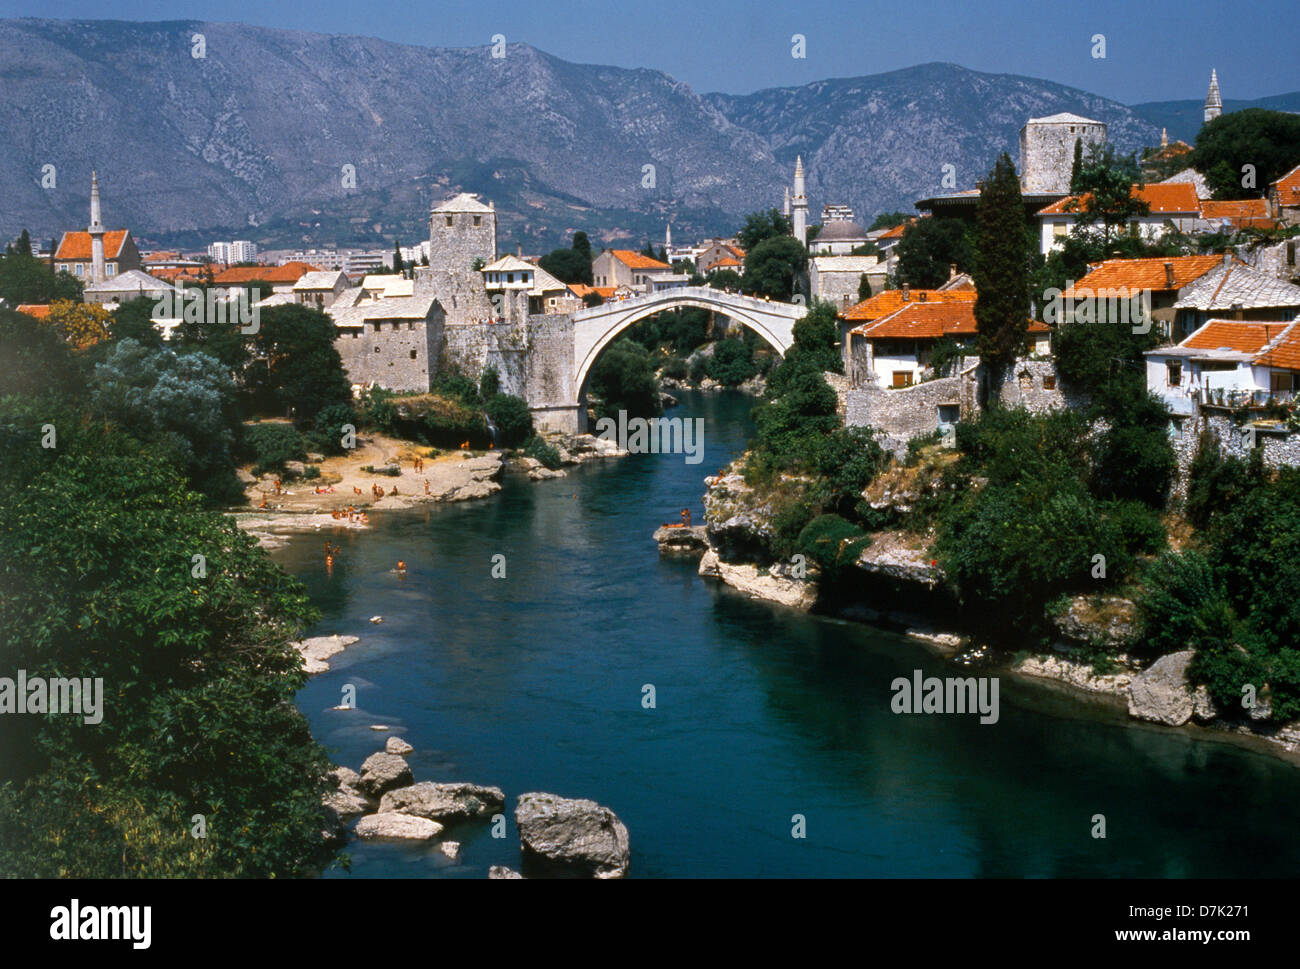 Mostar Bosnia River Bridge (original pre-war) & Town Neretva Rivers - Stock Image